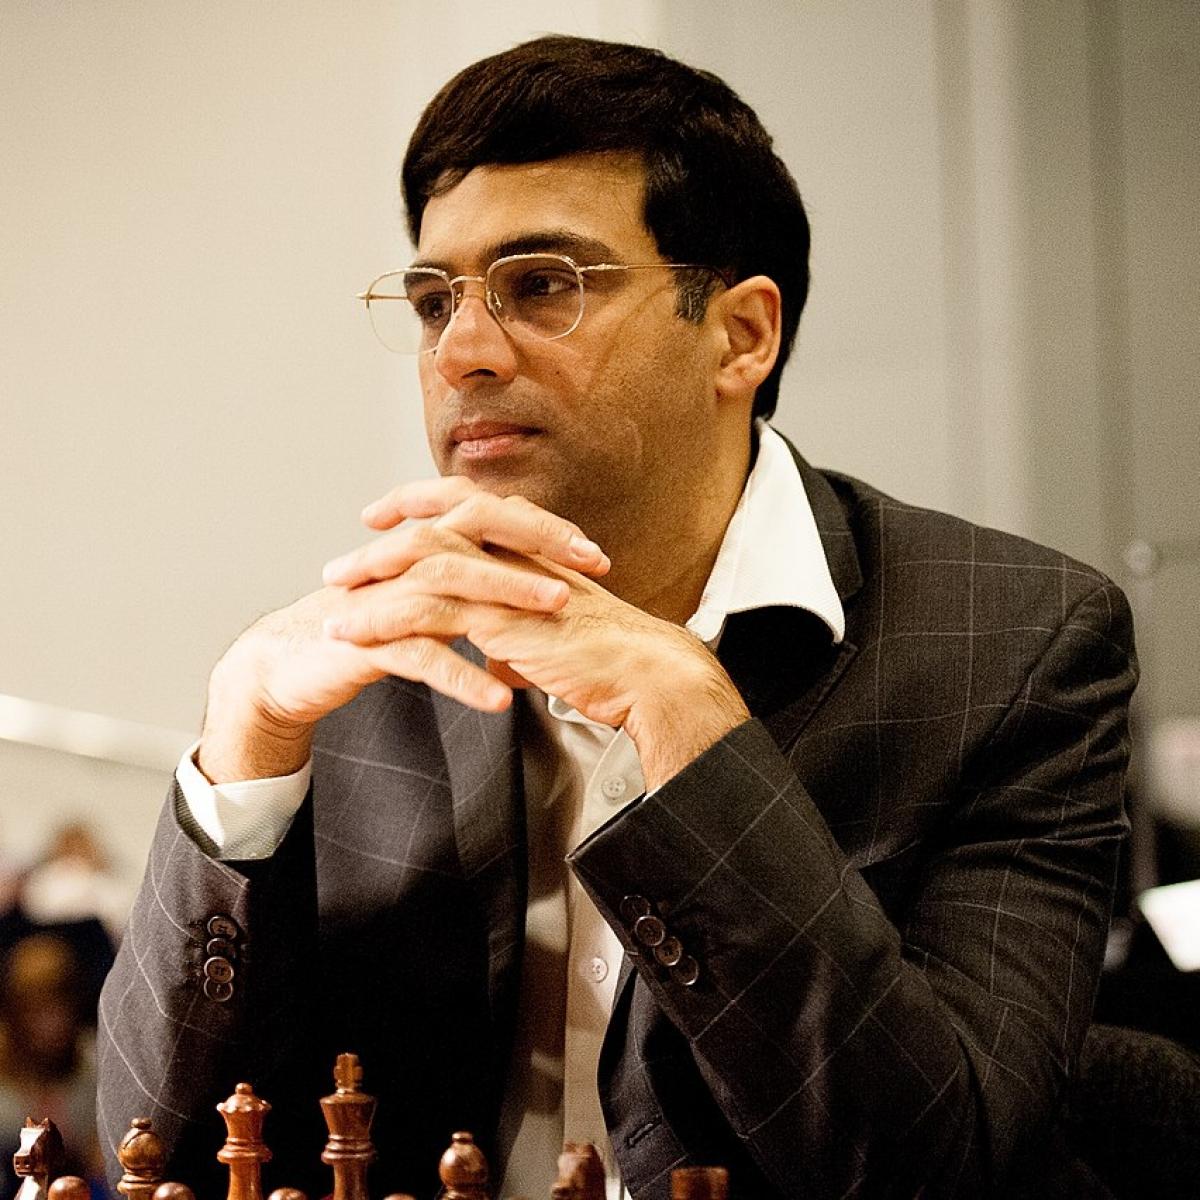 Zerodha's Nikhil Kamath prompts social media debate after 'beating' Viswanathan Anand in virtual chess match